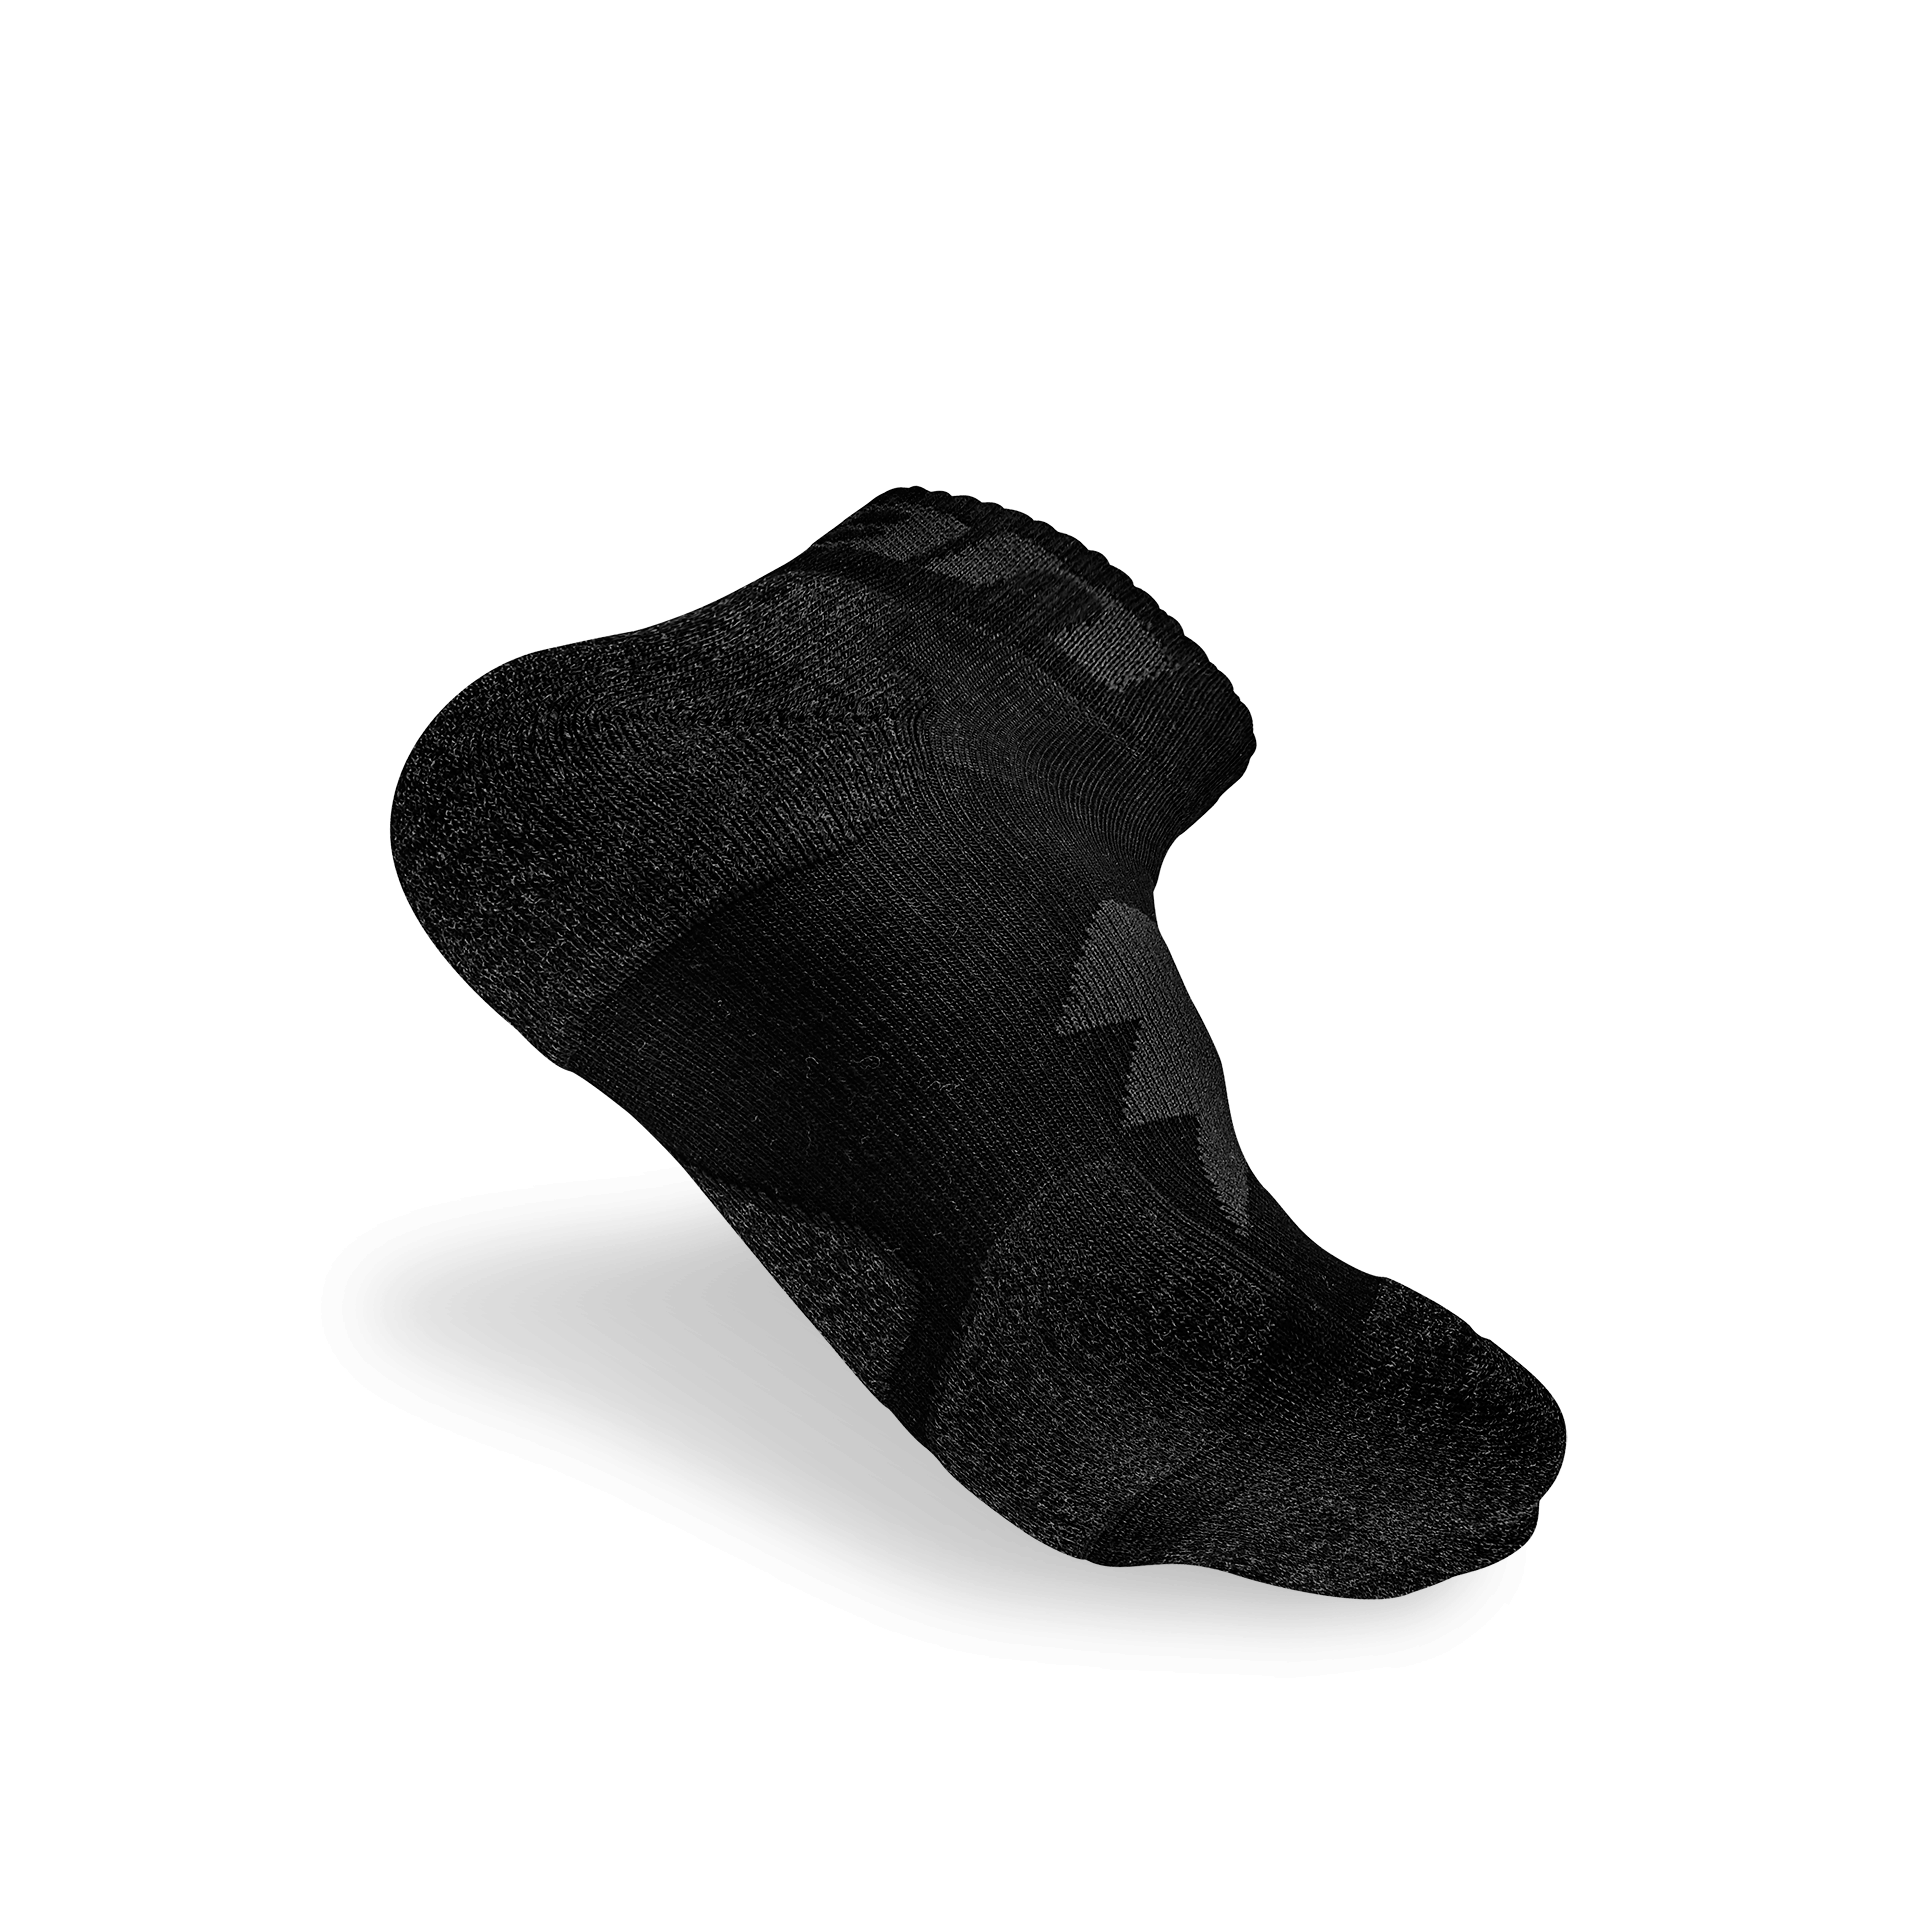 功能慢跑襪 - 閃電